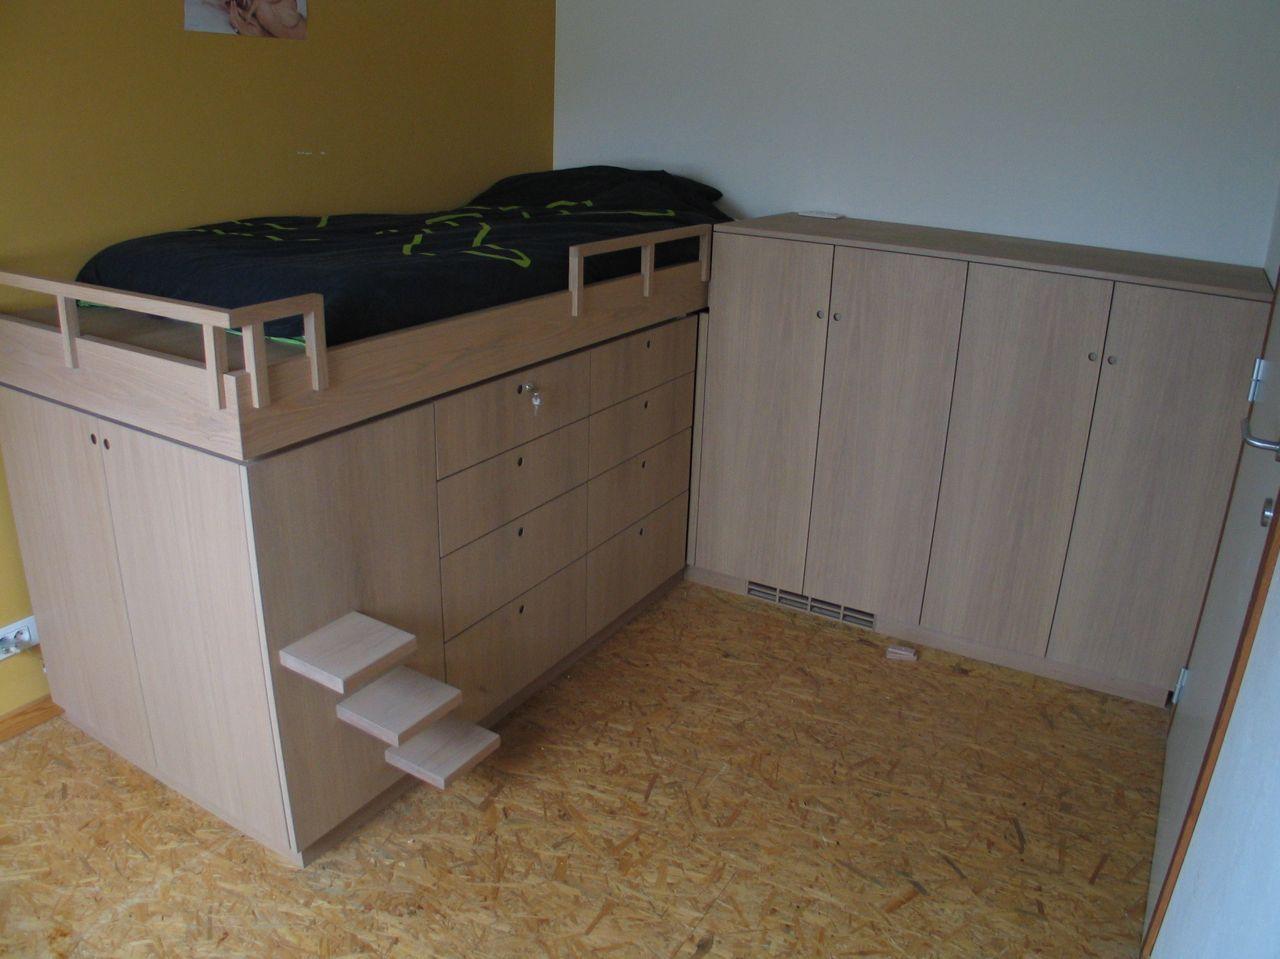 Top Bed en kasten. – Frits Kuitenbrouwer Tailor-made Furniture LC81